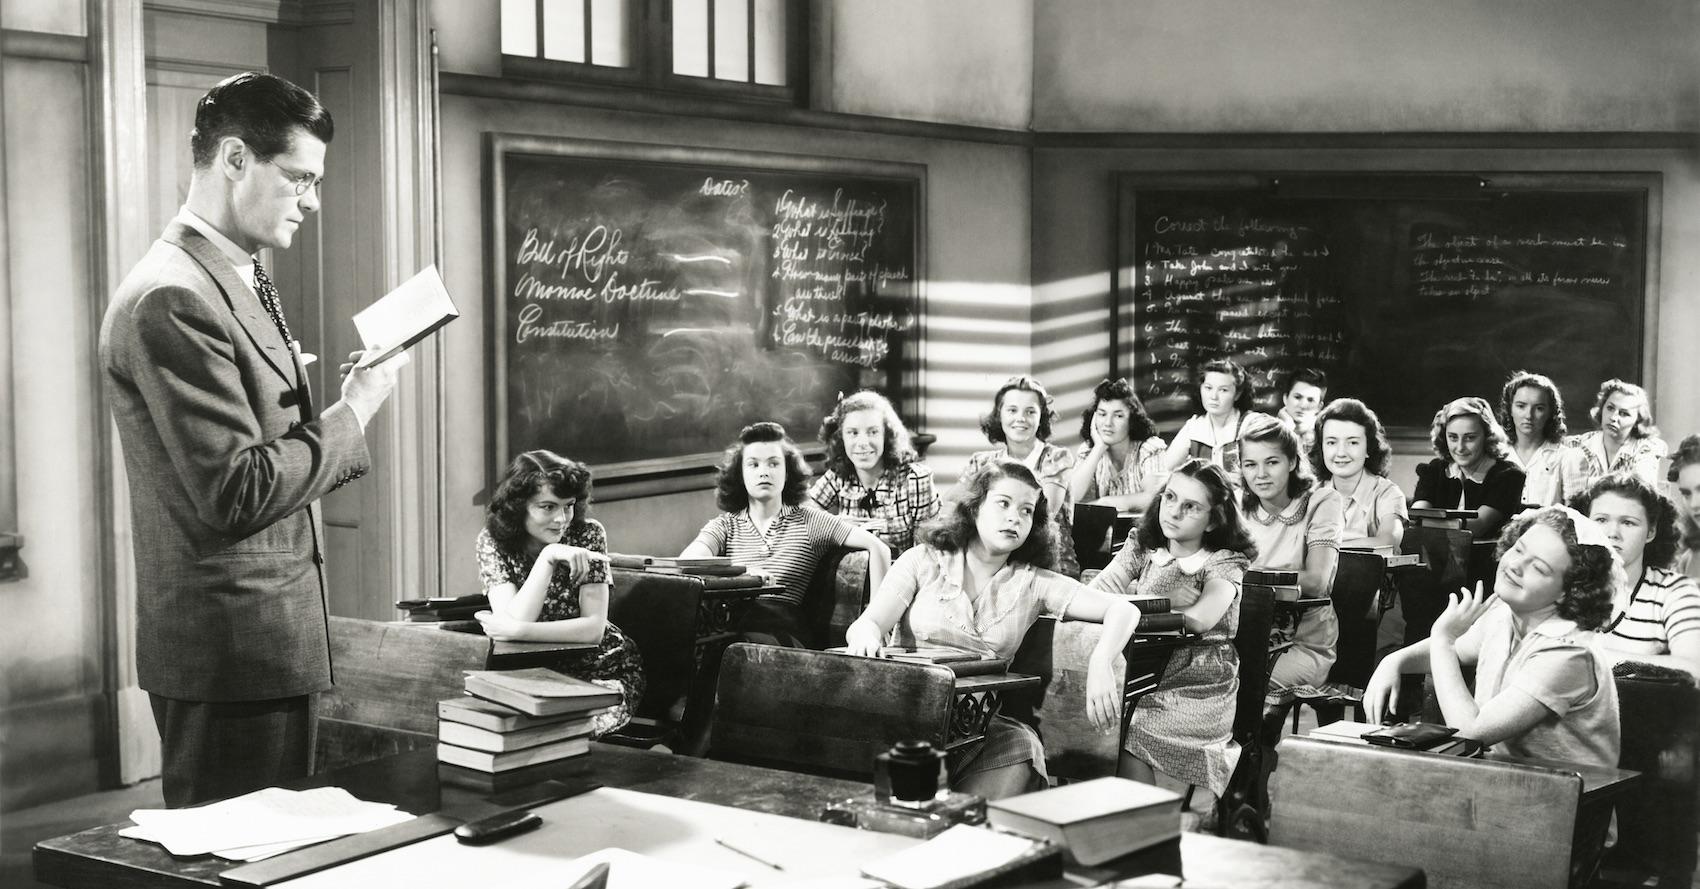 women in science careers essay